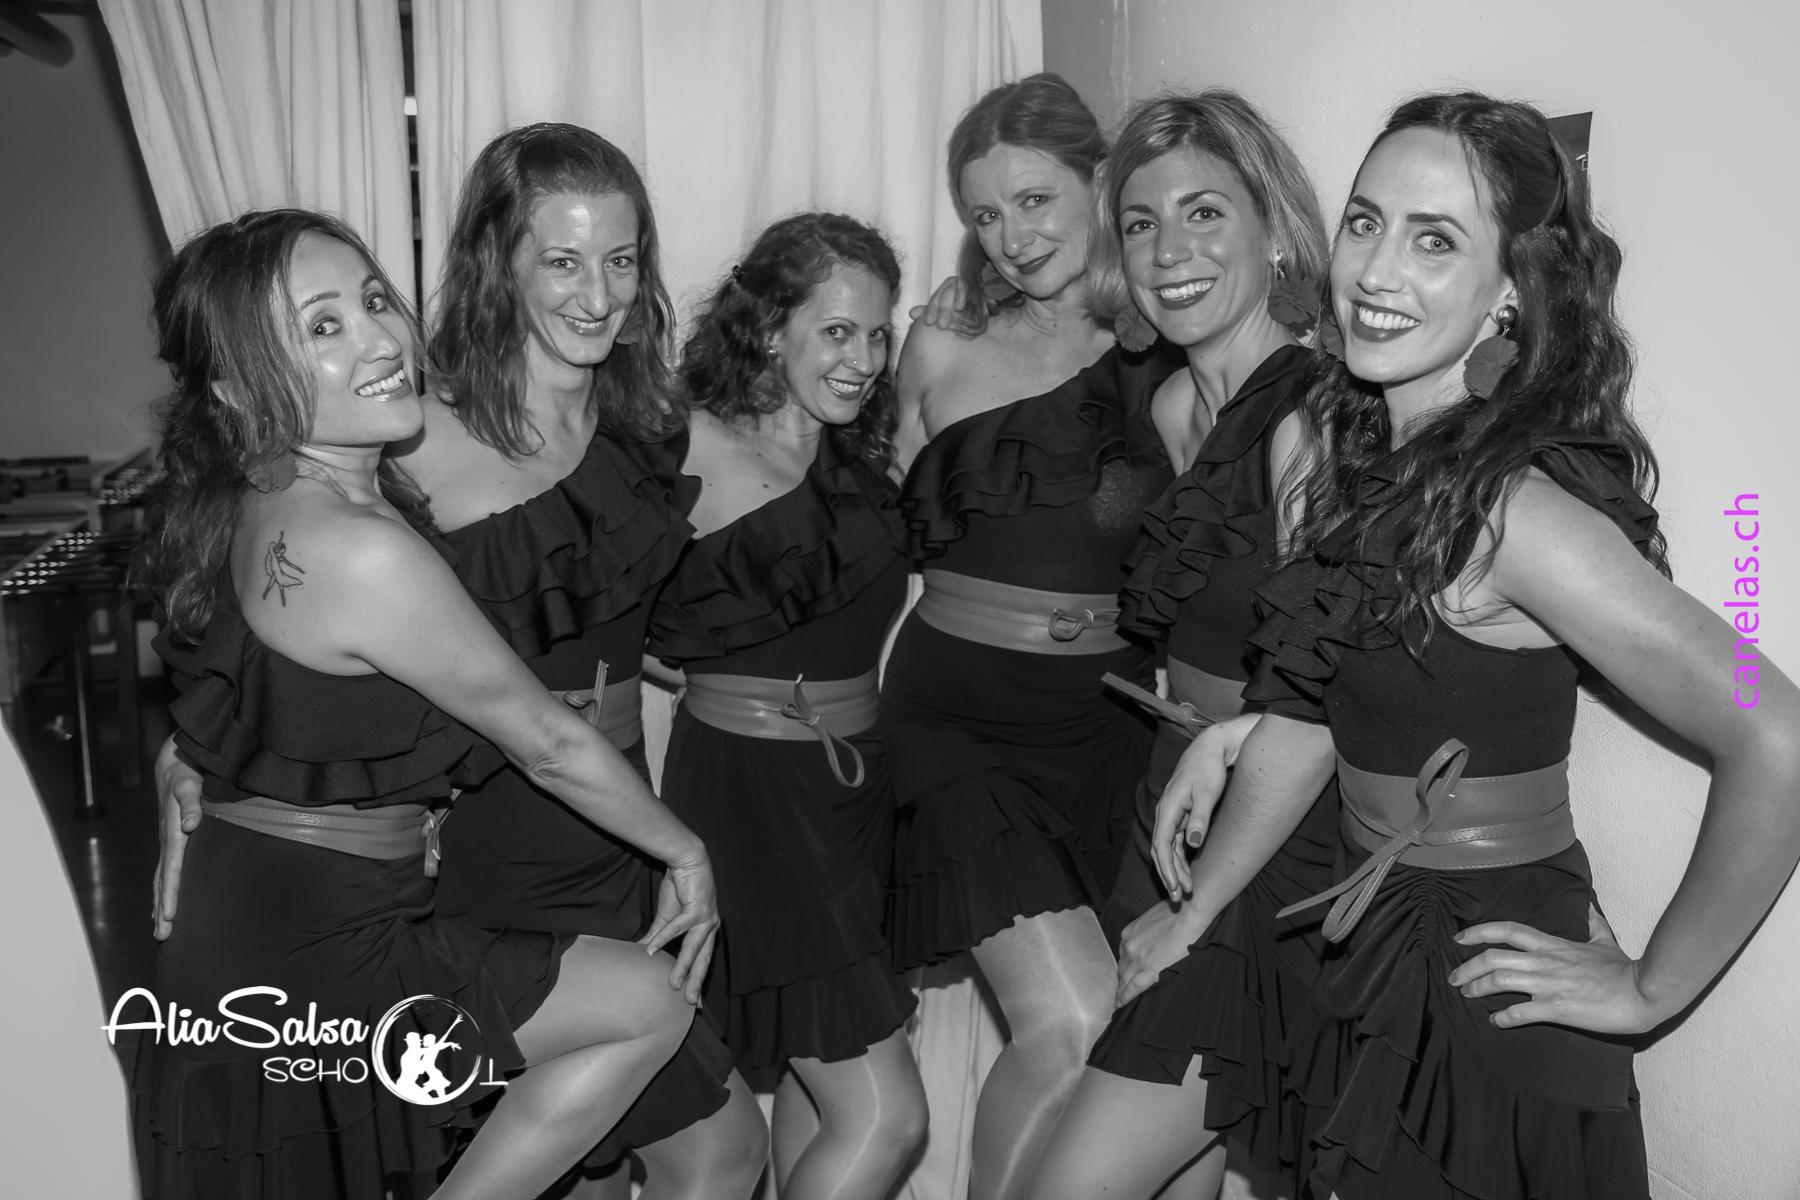 AliaSalsa ecole de danse lausanne soiree bachata salsa cubaineAlia Salsa Soireé Salsa - Bachata-14